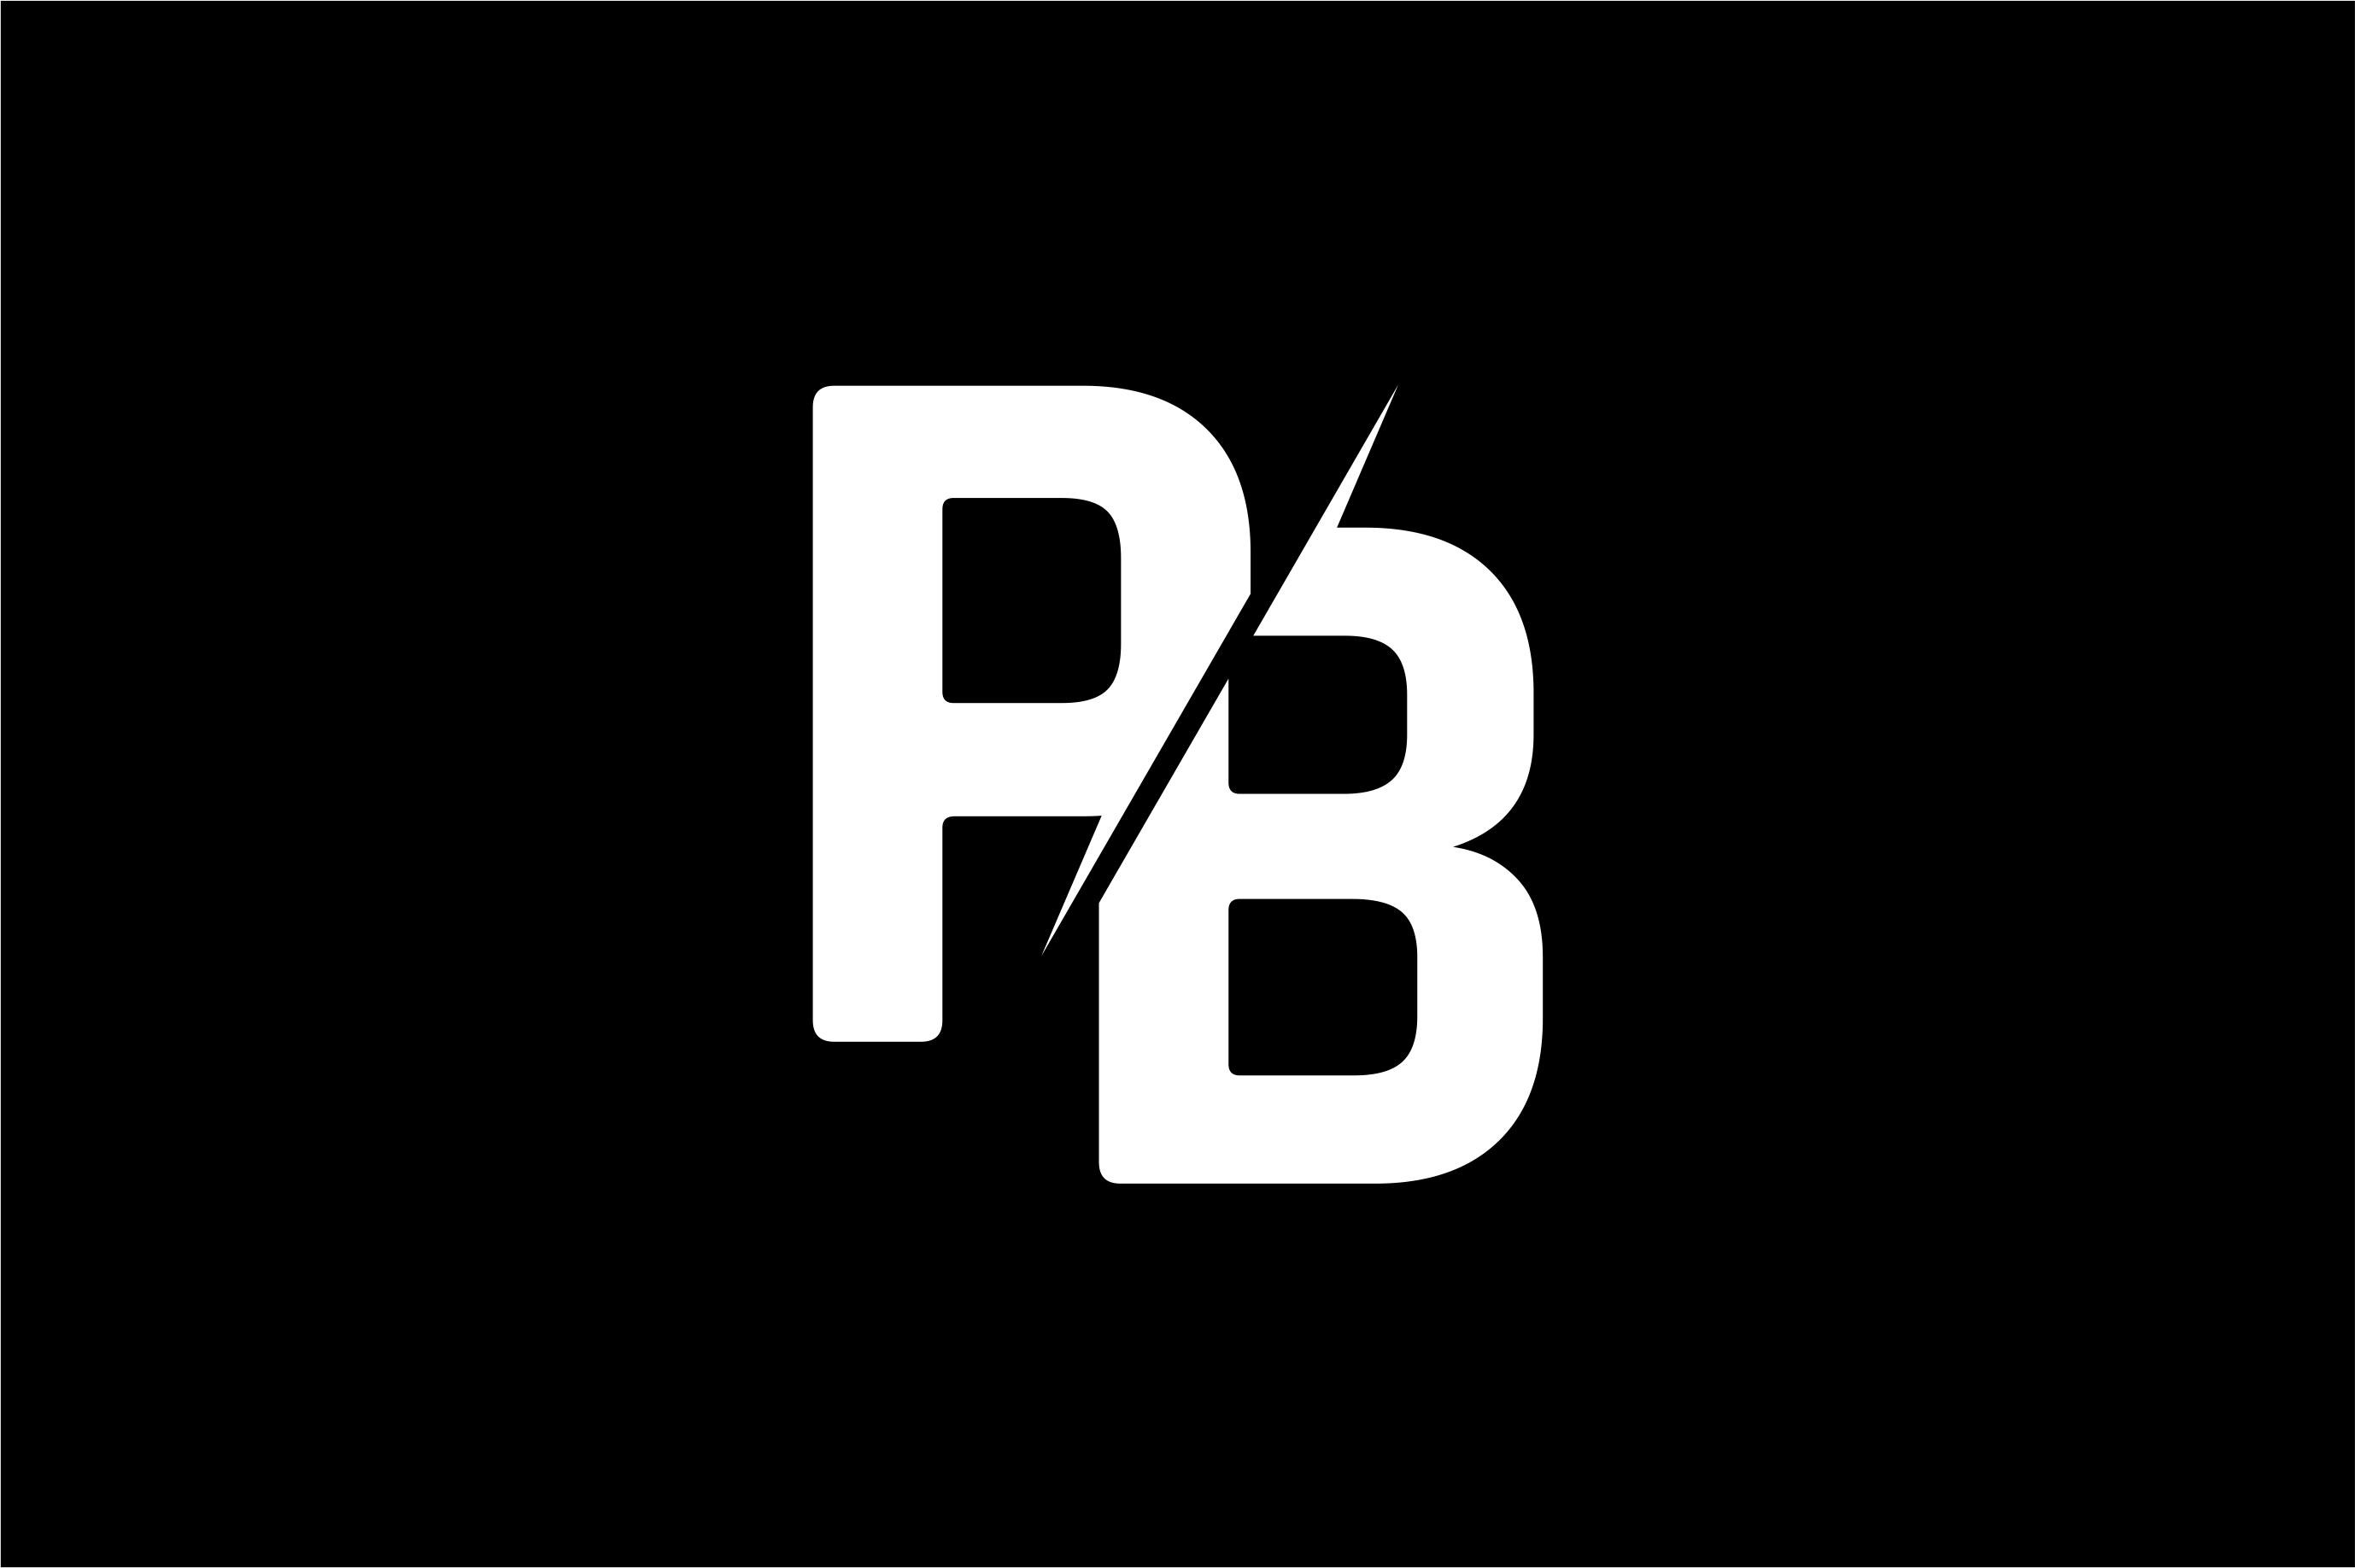 Monogram PB Logo Design.